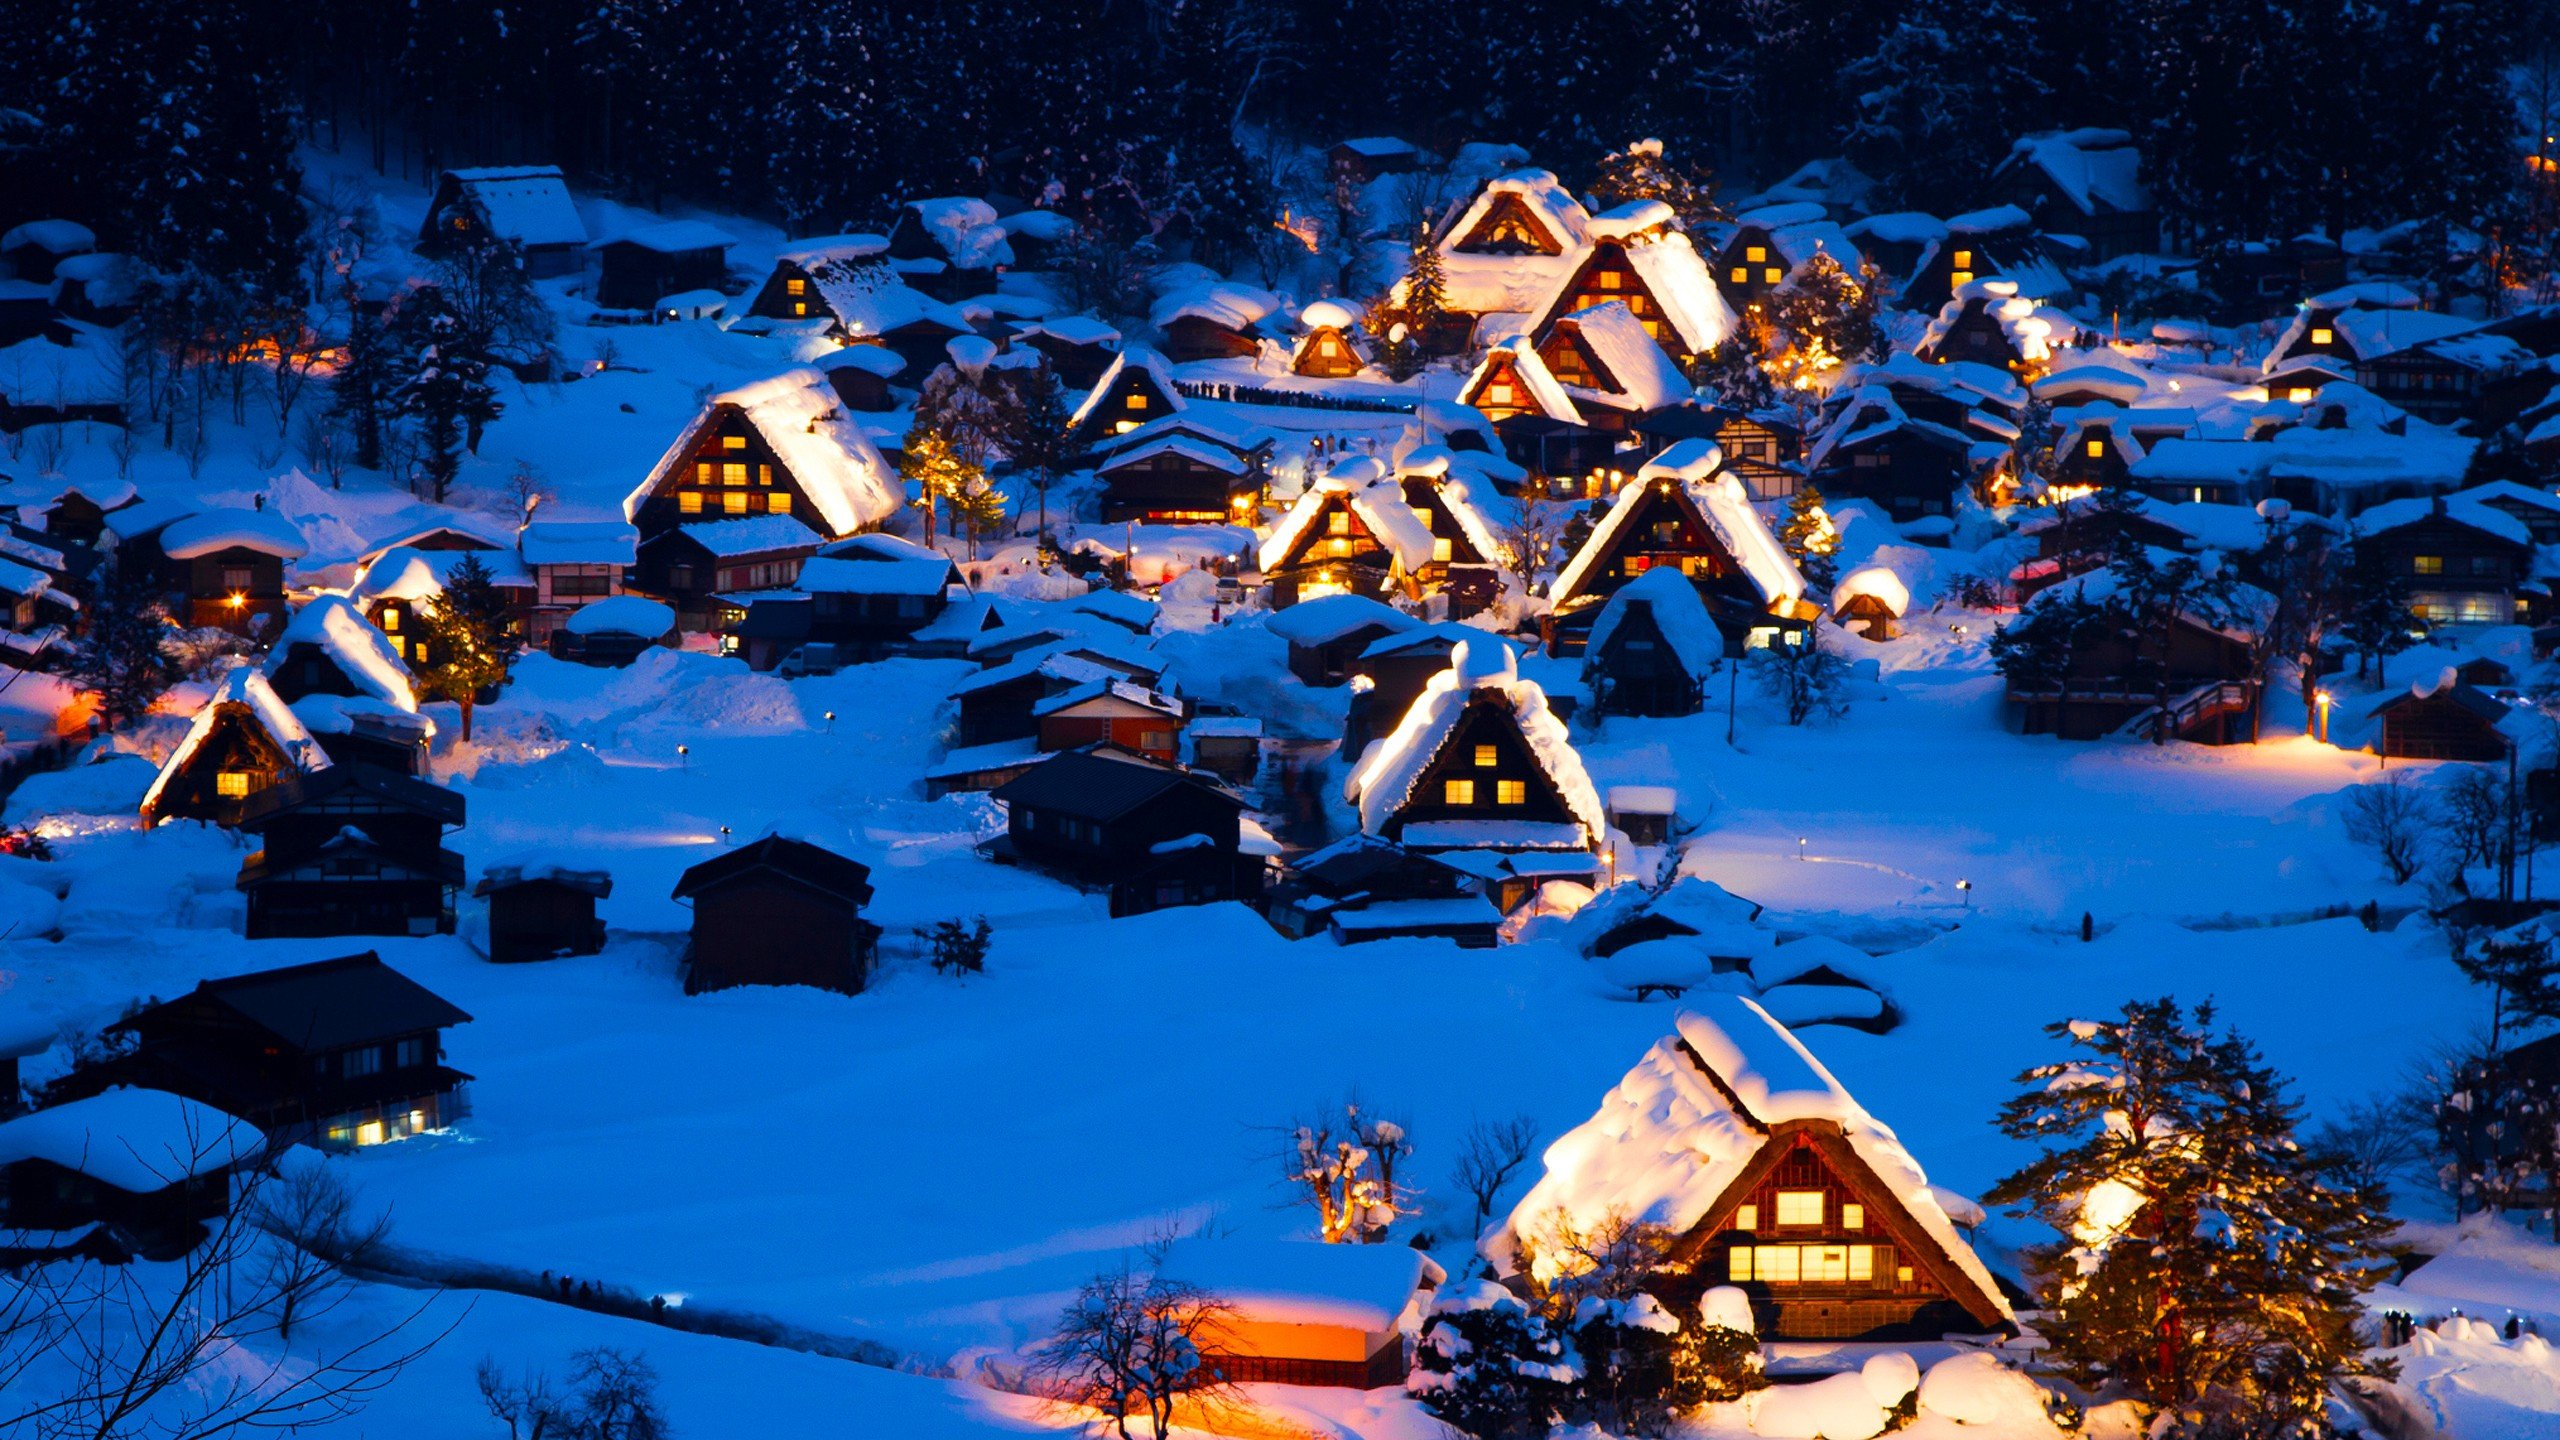 Village winter hd wallpapers desktop and mobile images for Sfondi invernali per desktop gratis